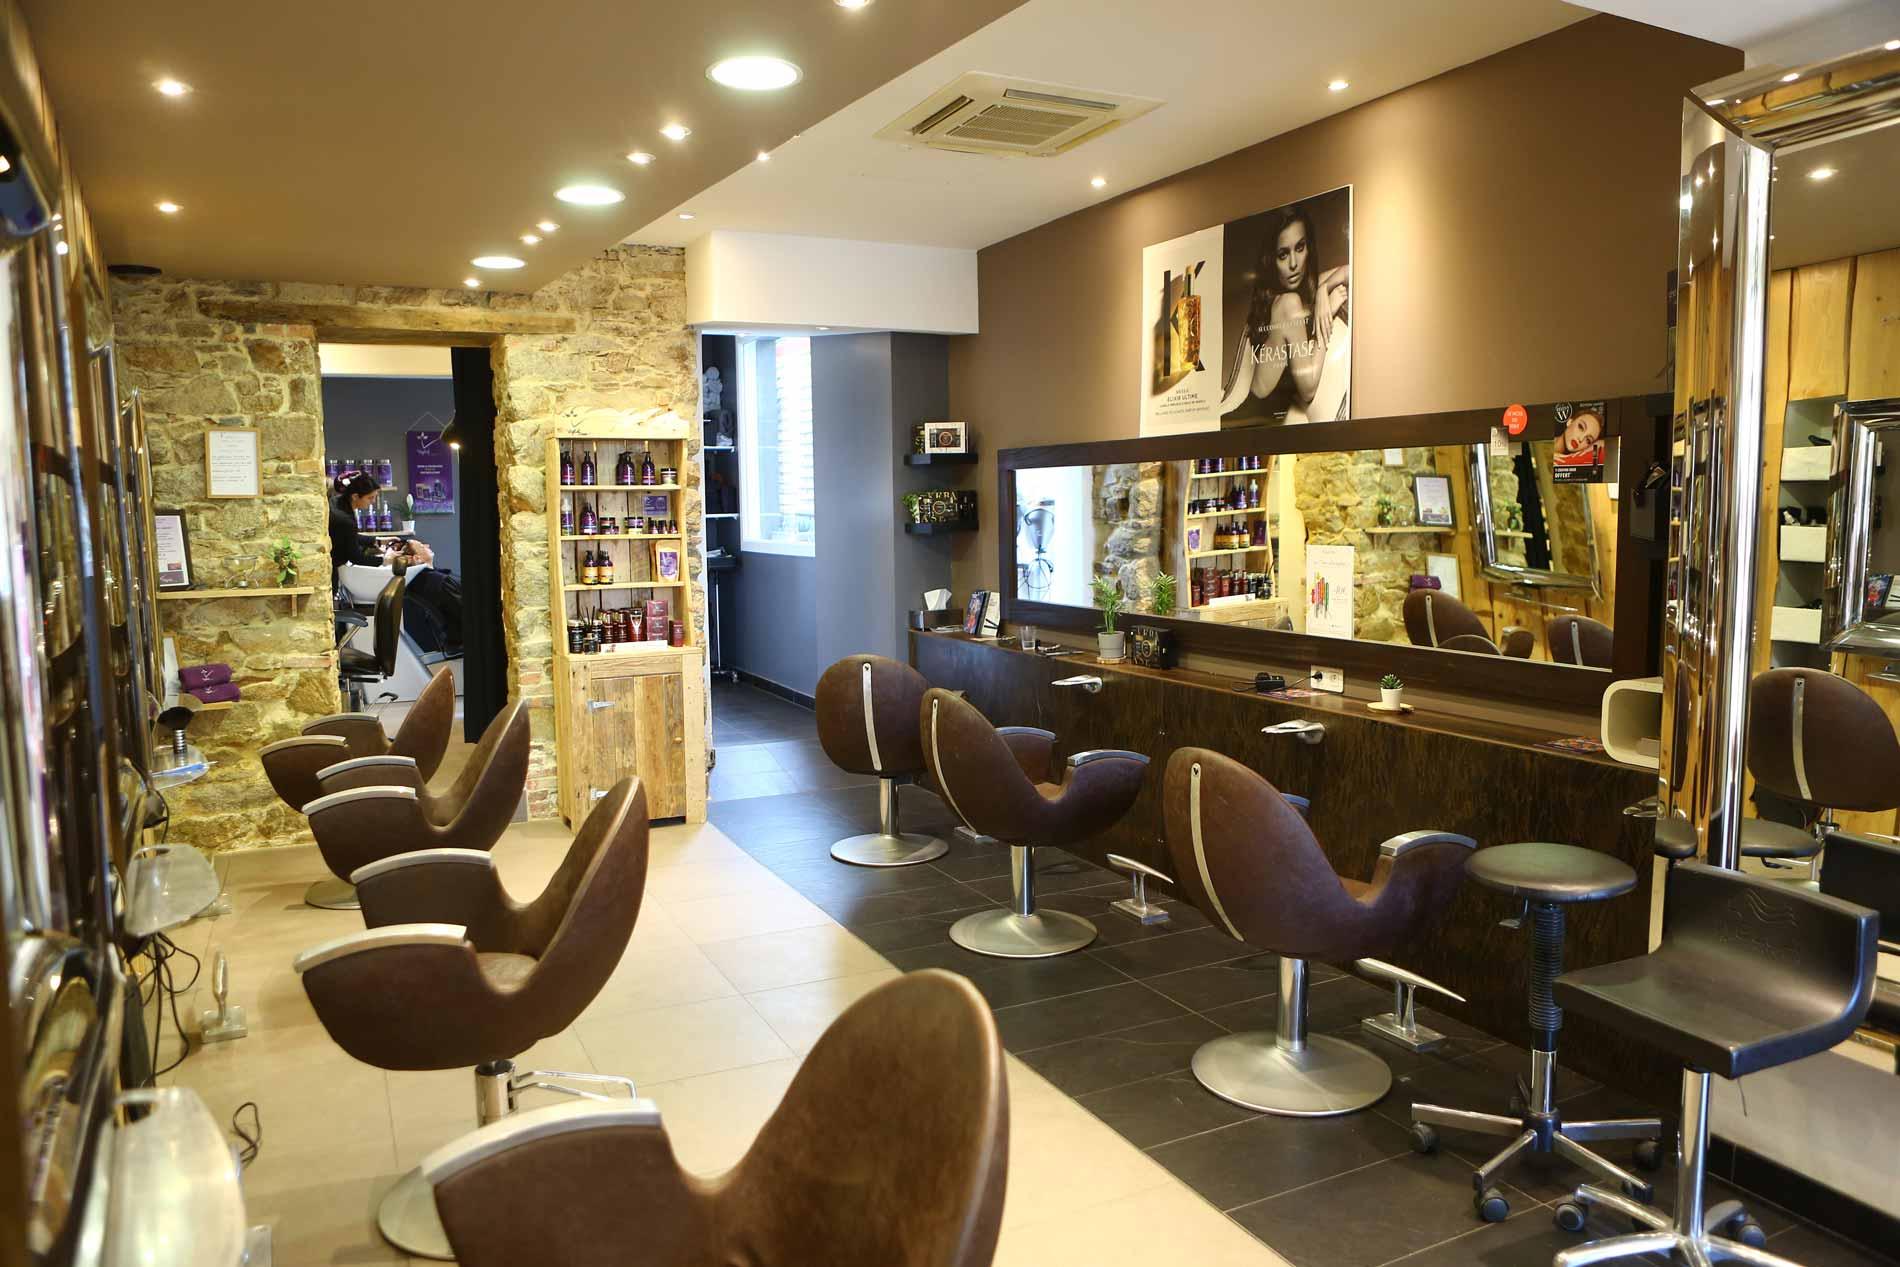 Idee Deco Salon Design decor salon de coiffure femme الصور • joansmurder